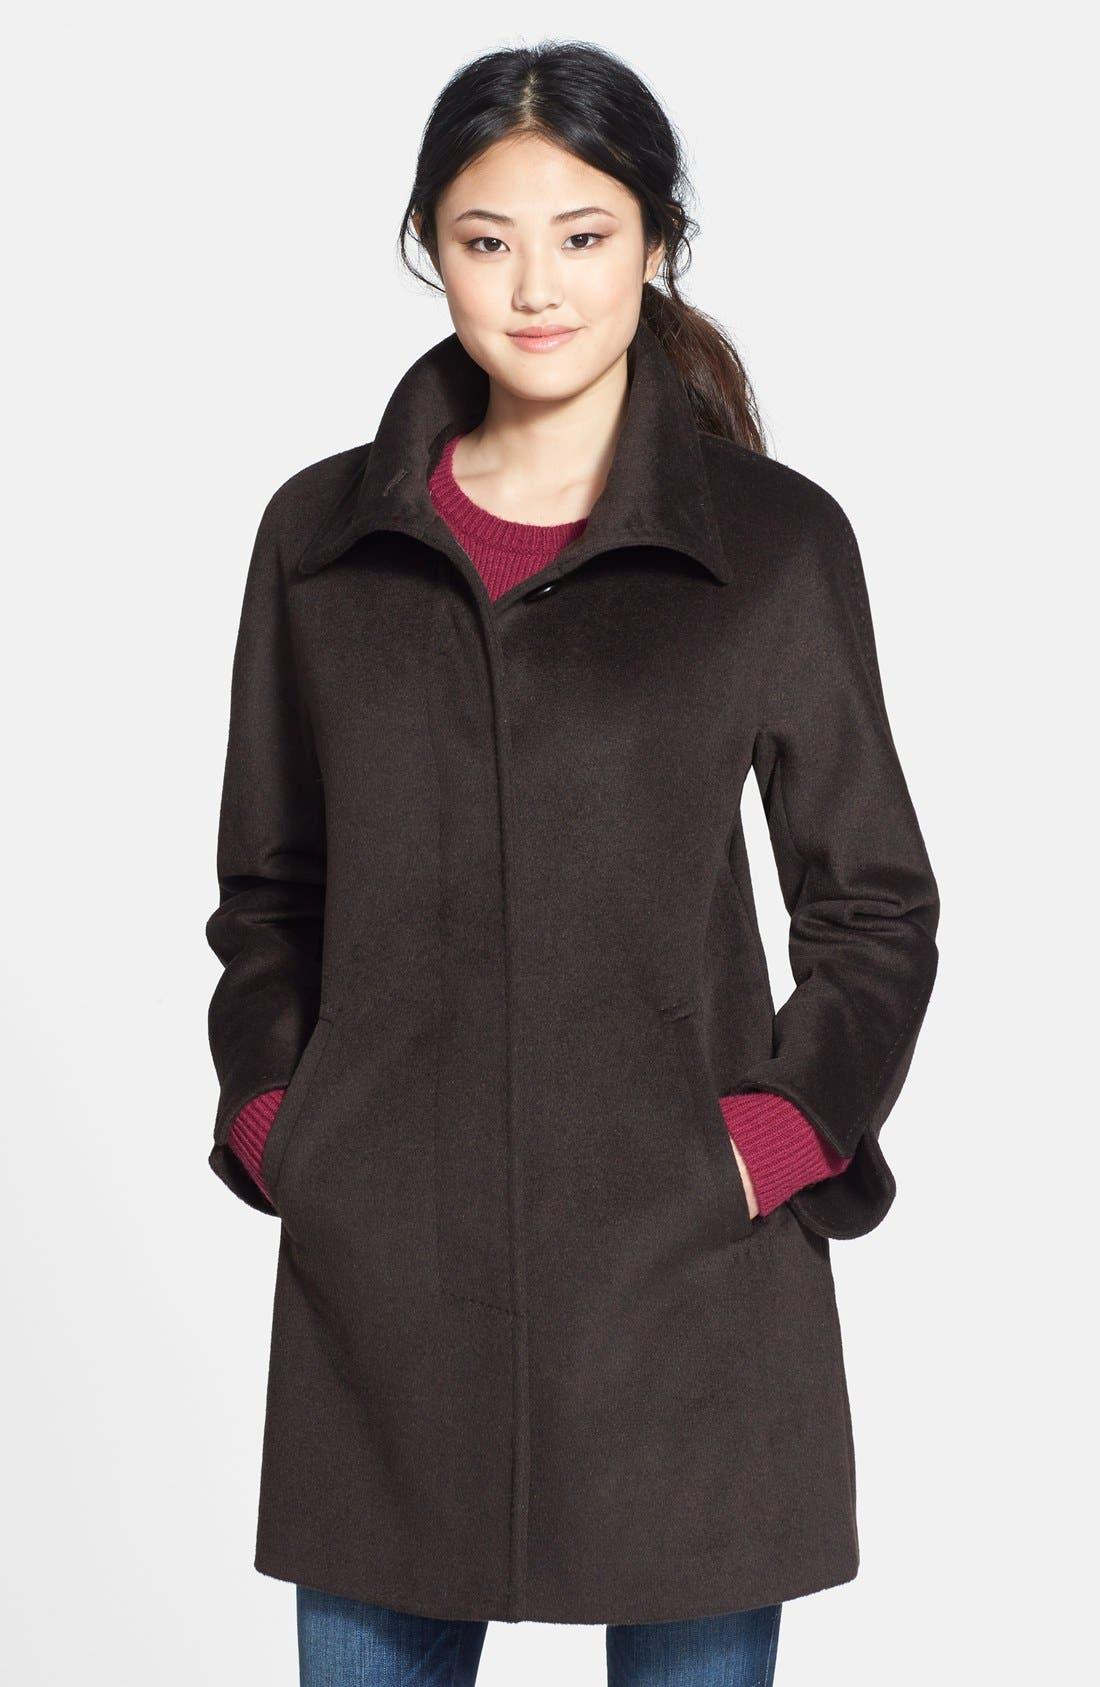 Alternate Image 1 Selected - Ellen Tracy Funnel Collar Wool Blend Topper (Regular & Petite) (Nordstrom Exclusive)